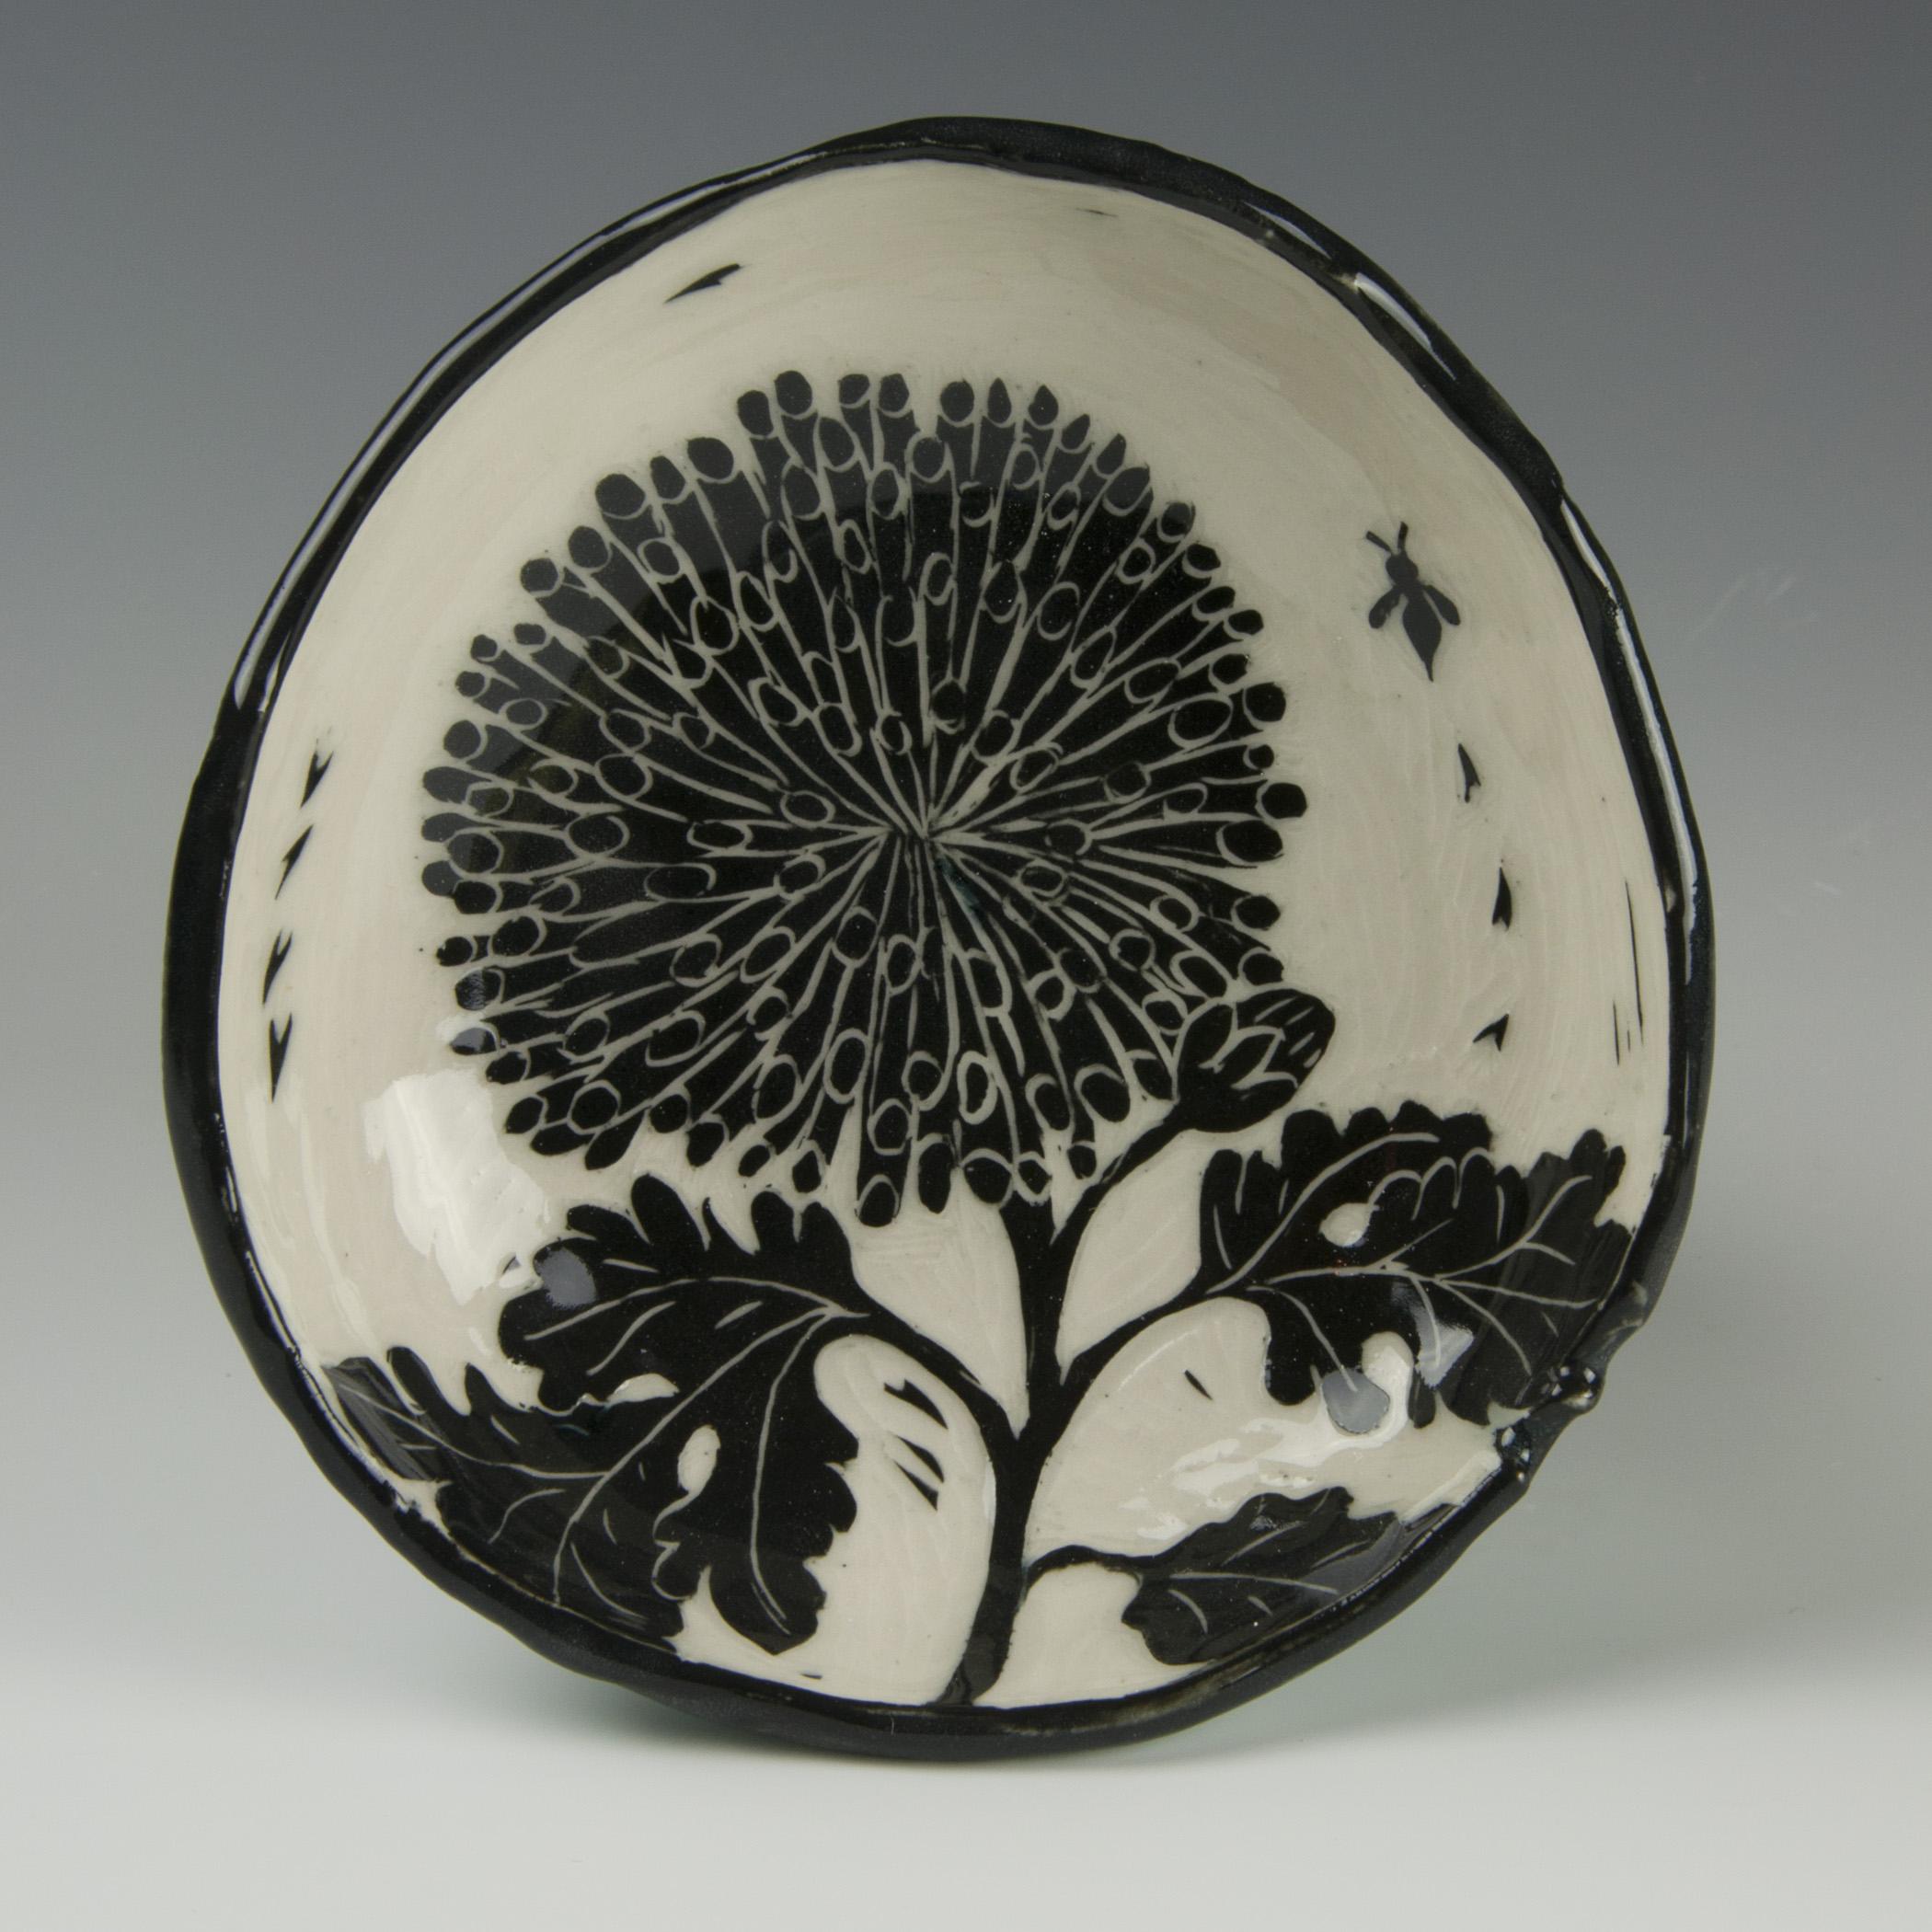 Rae Stark__Chrysanthemum Plate.jpg